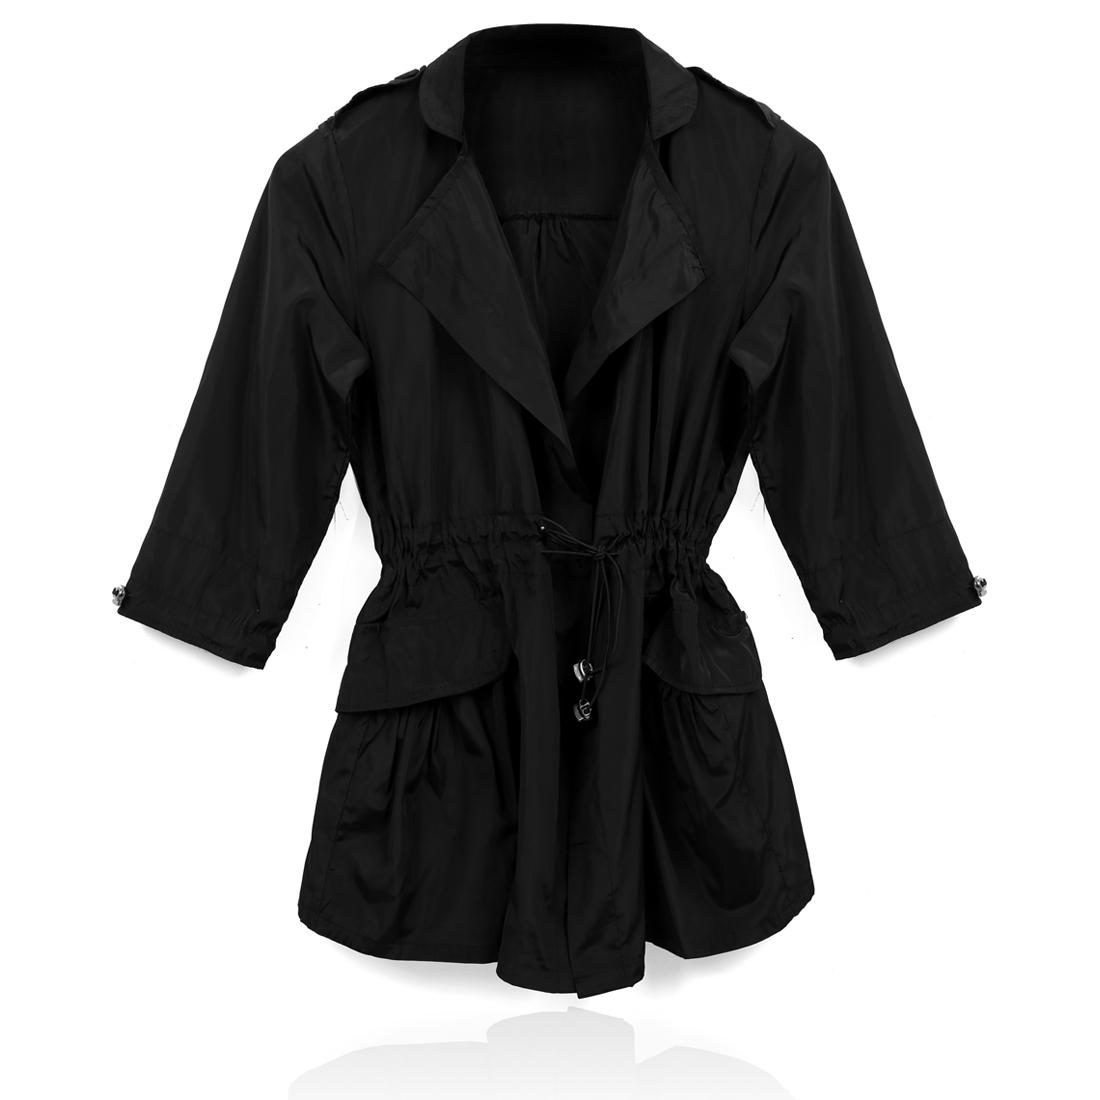 S 3/4 Sleeves Drawstring Waist Side Pocket Trench Coat Windbreaker Black for Ladies